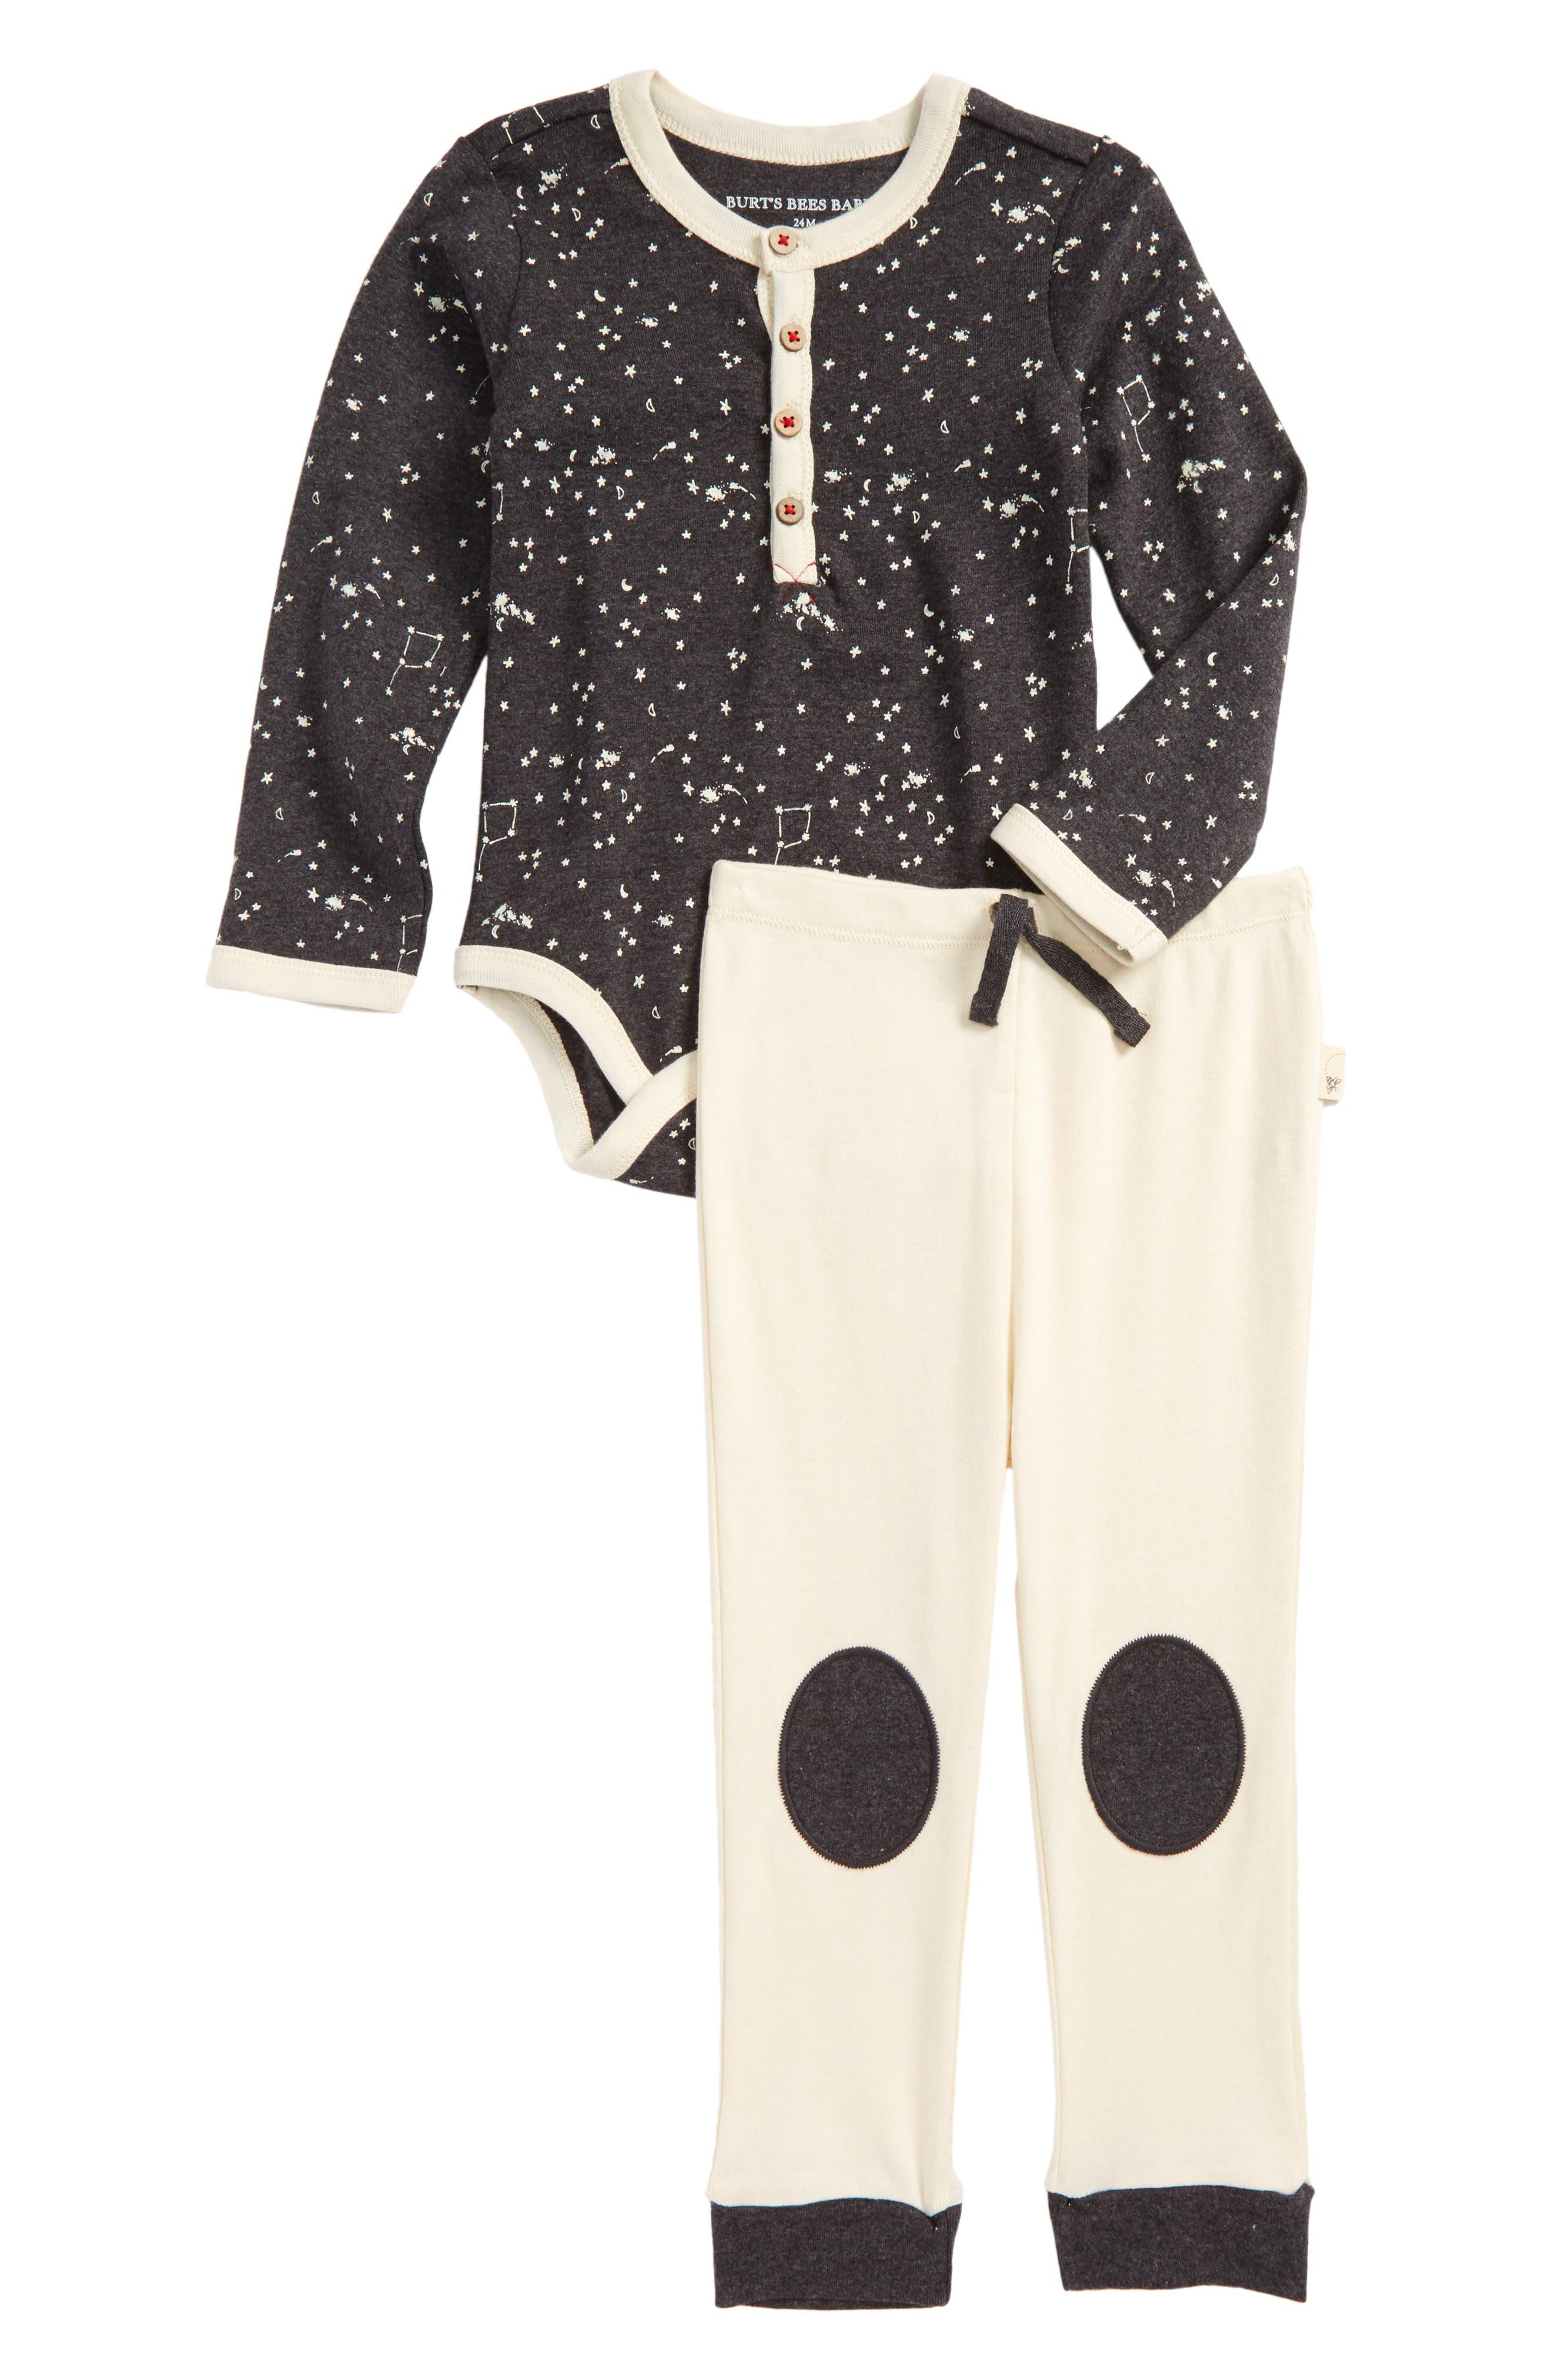 Burt's Bees Organic Cotton Bodysuit & Pants Set (Baby)